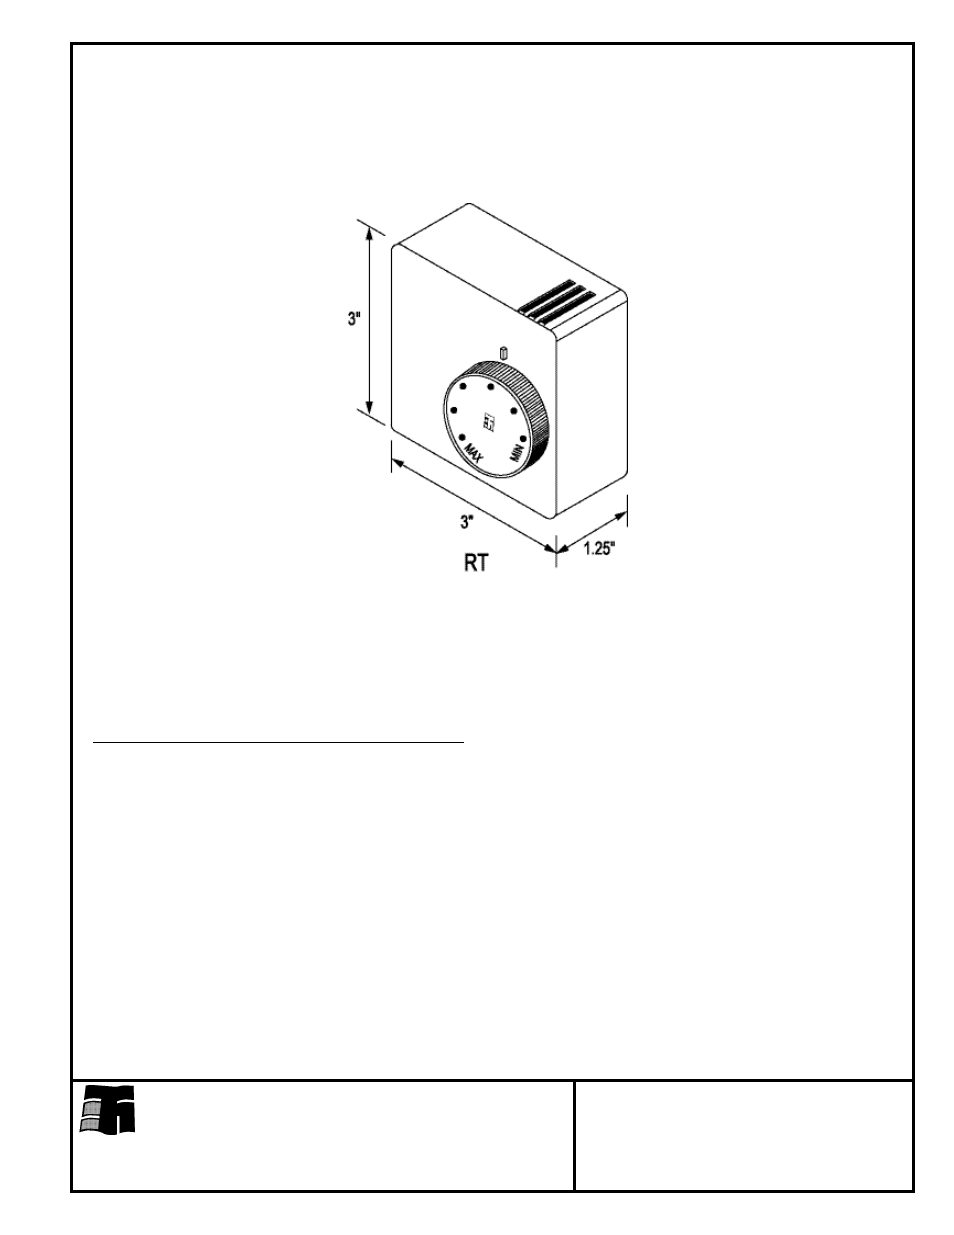 thermolec electric boiler wiring diagram honda goldwing : 31 images - diagrams | bayanpartner.co